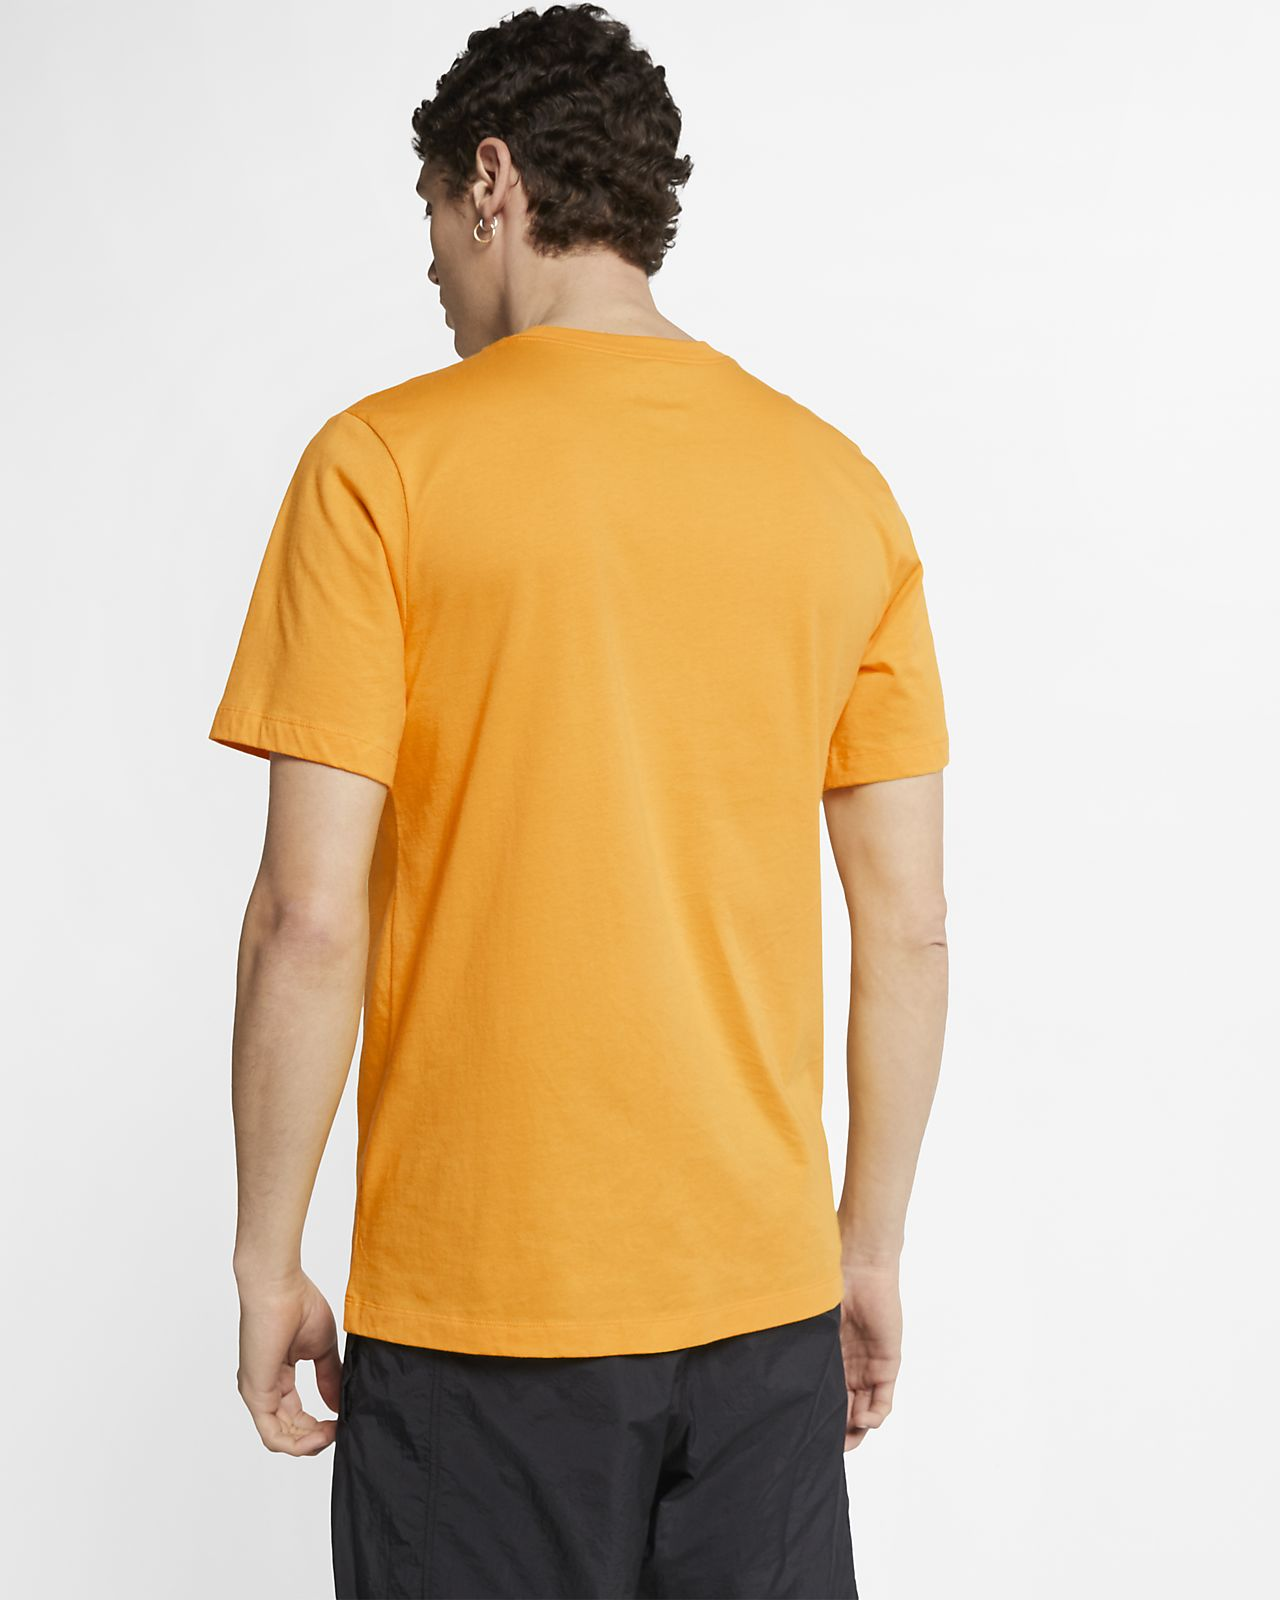 41659ab322007d Jordan Poolside Men s T-Shirt. Nike.com GB